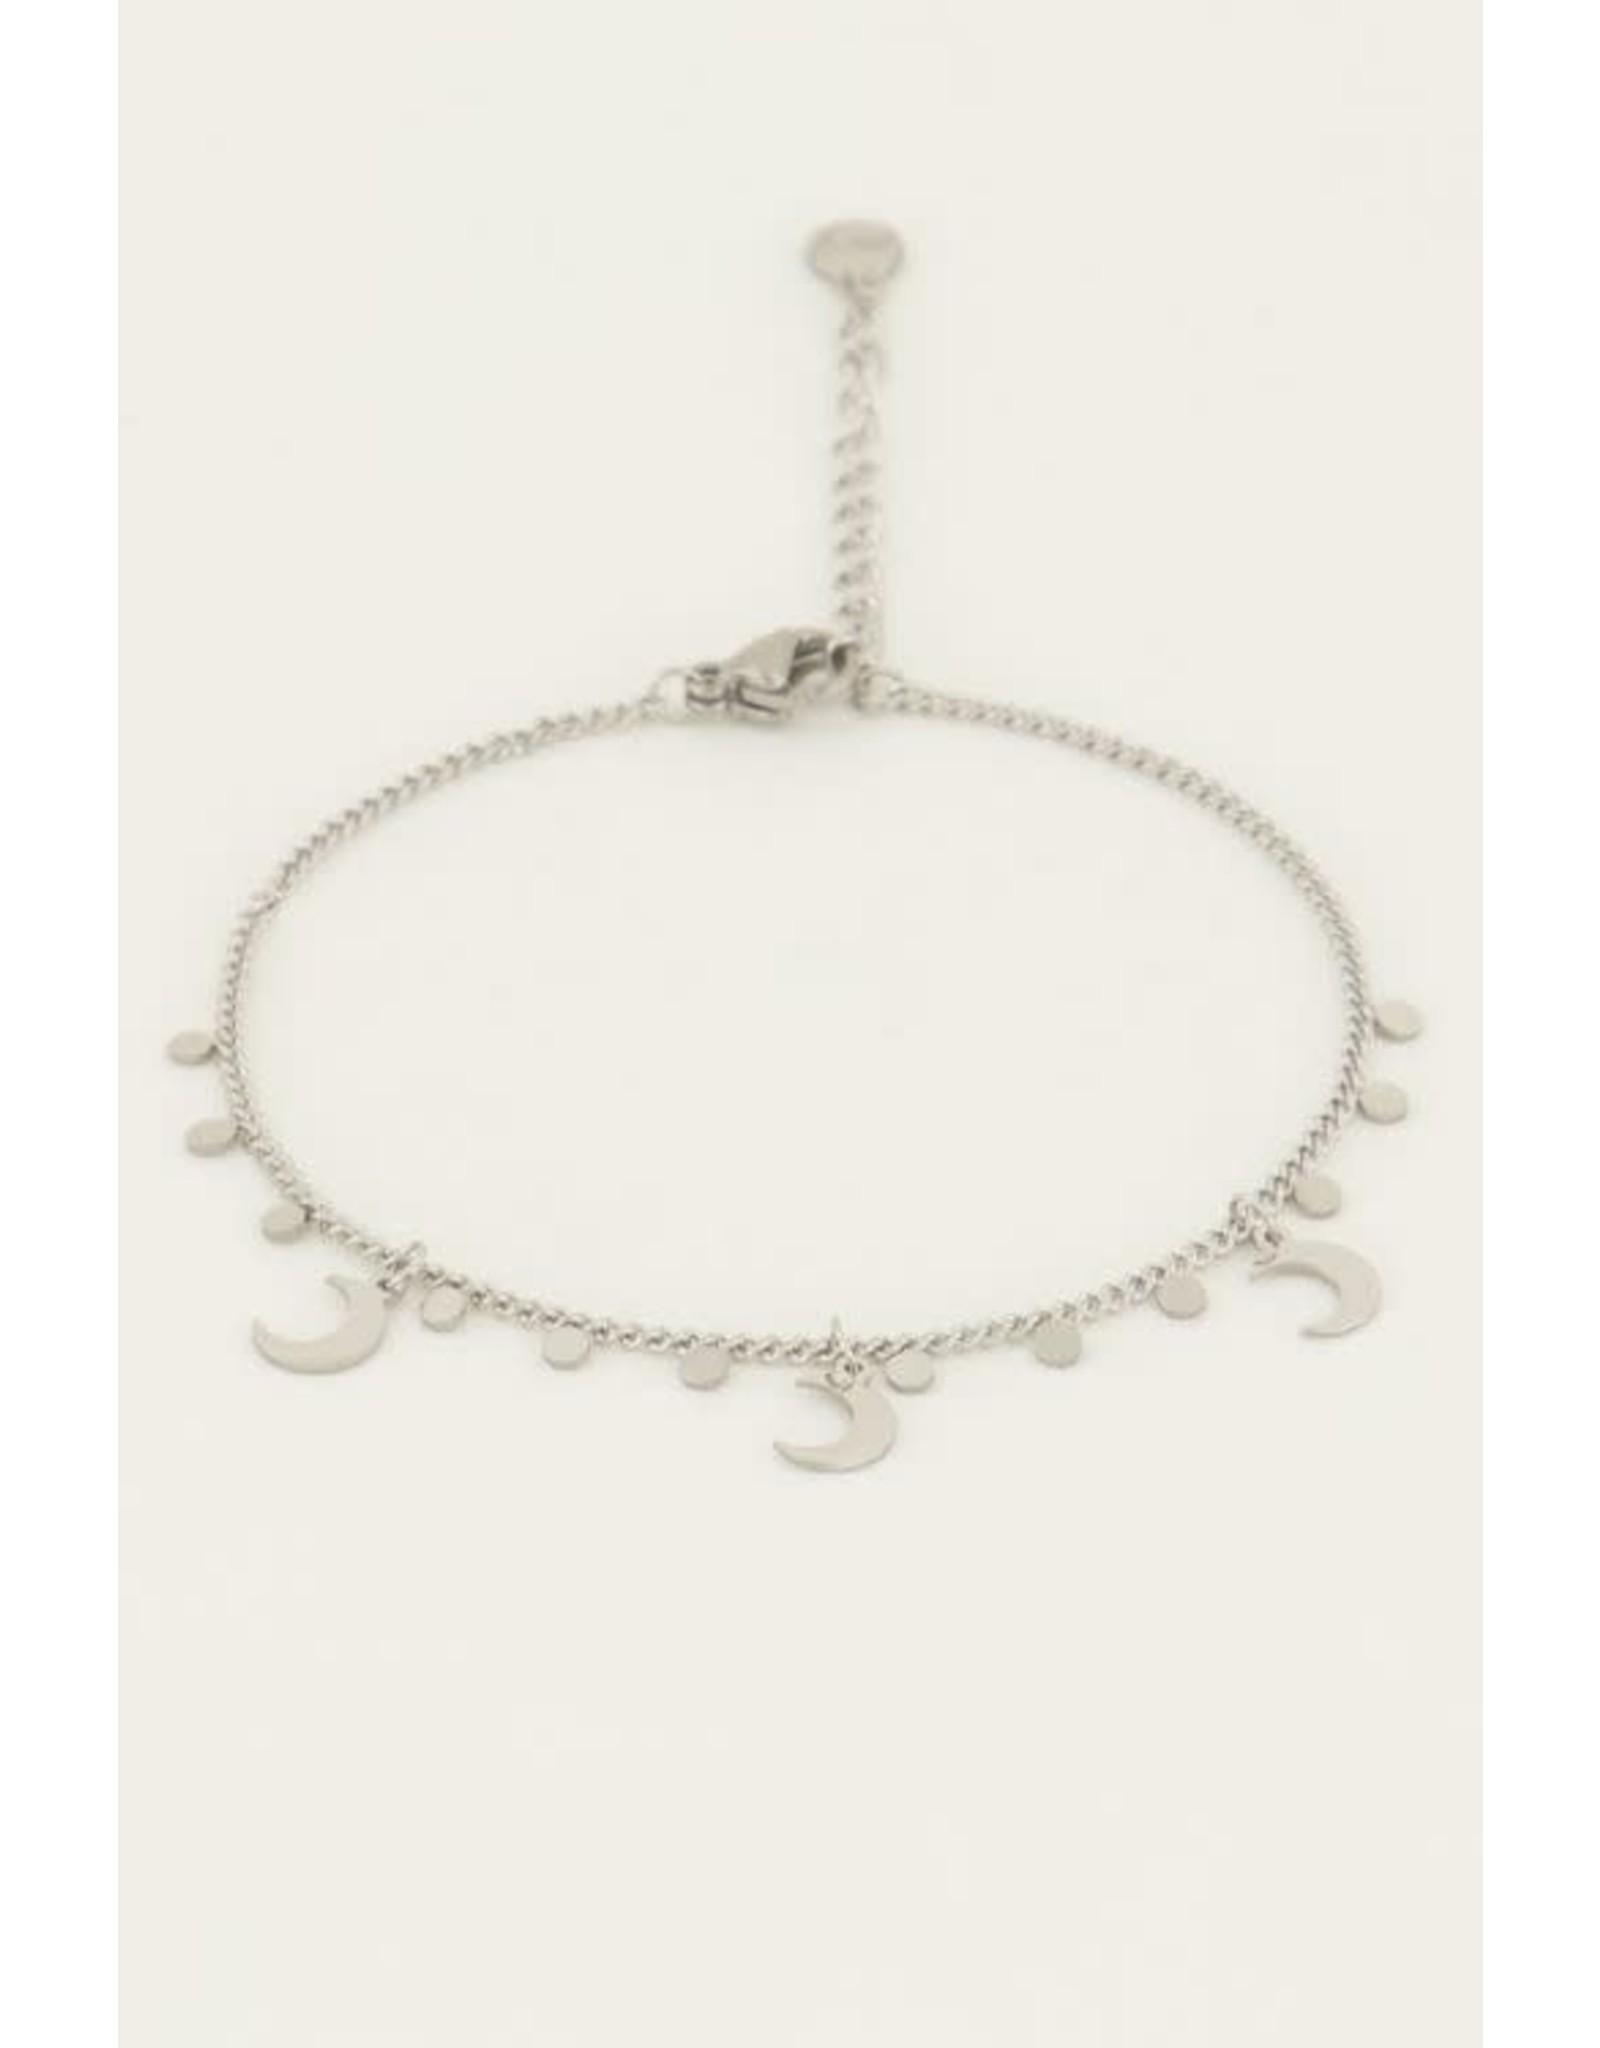 My Jewellery My Jewellery armband maantjes en bedels